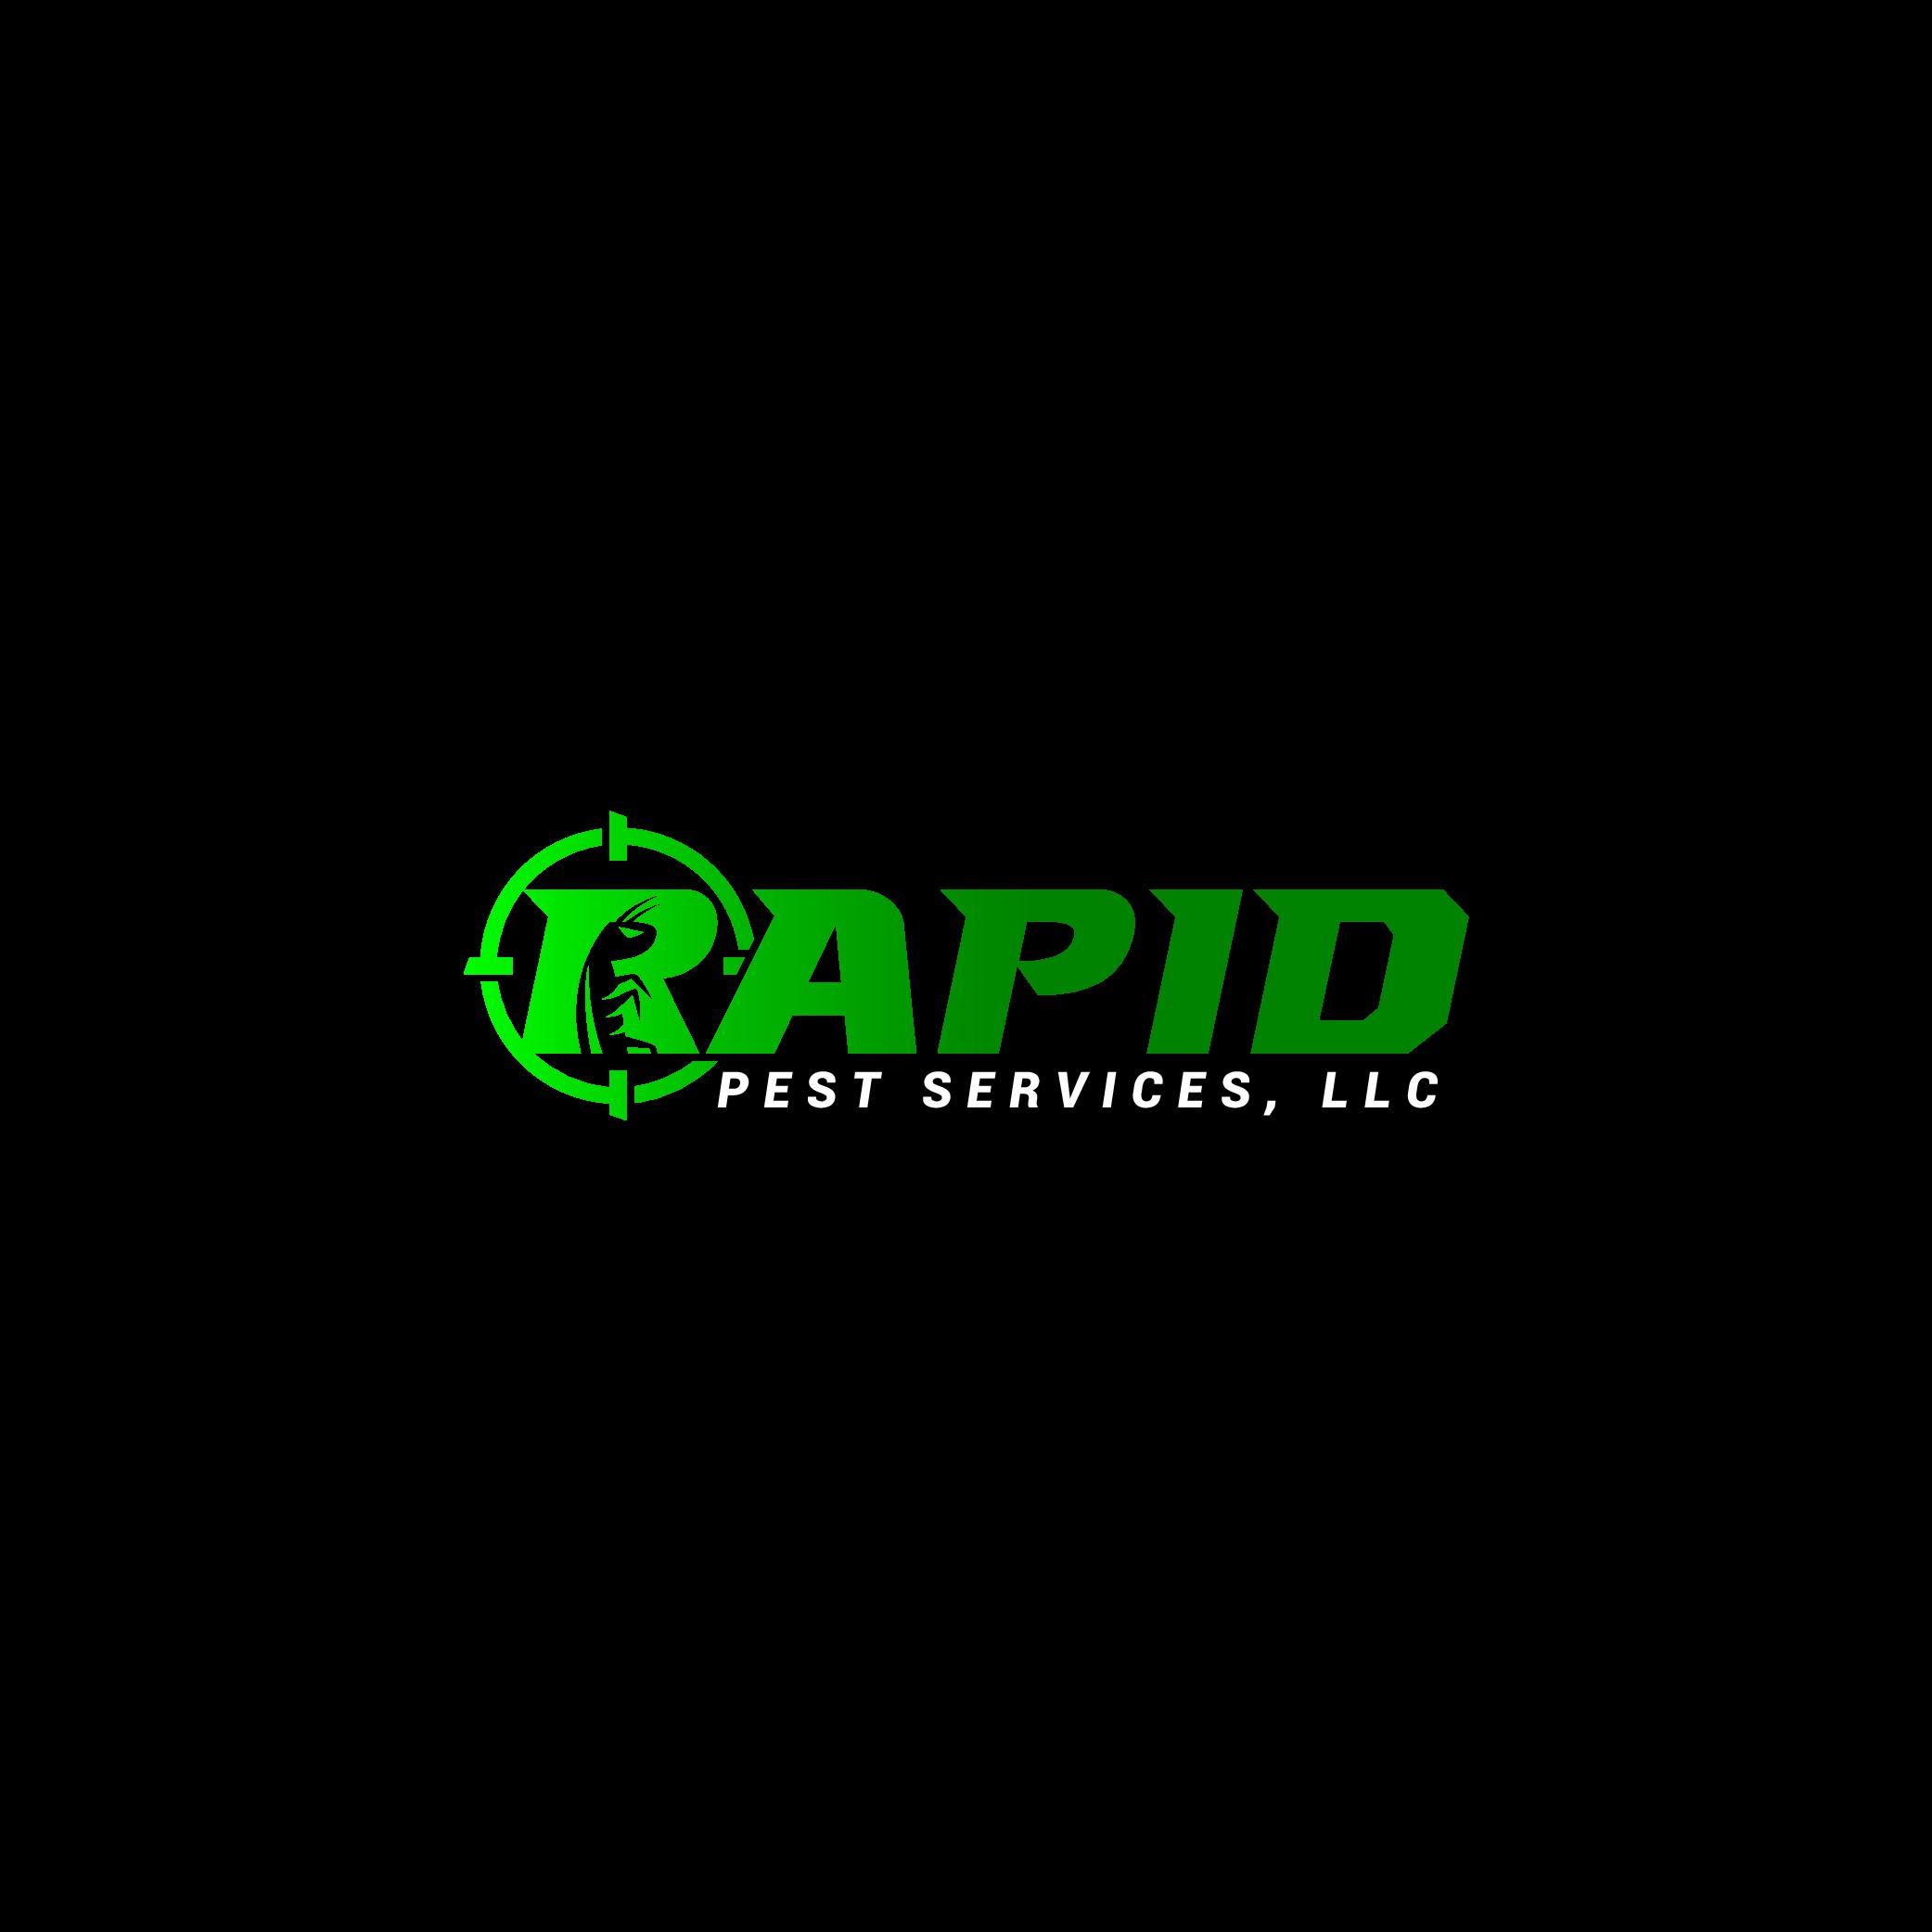 Rapid Pest Services design contest.  Creativity welcome.